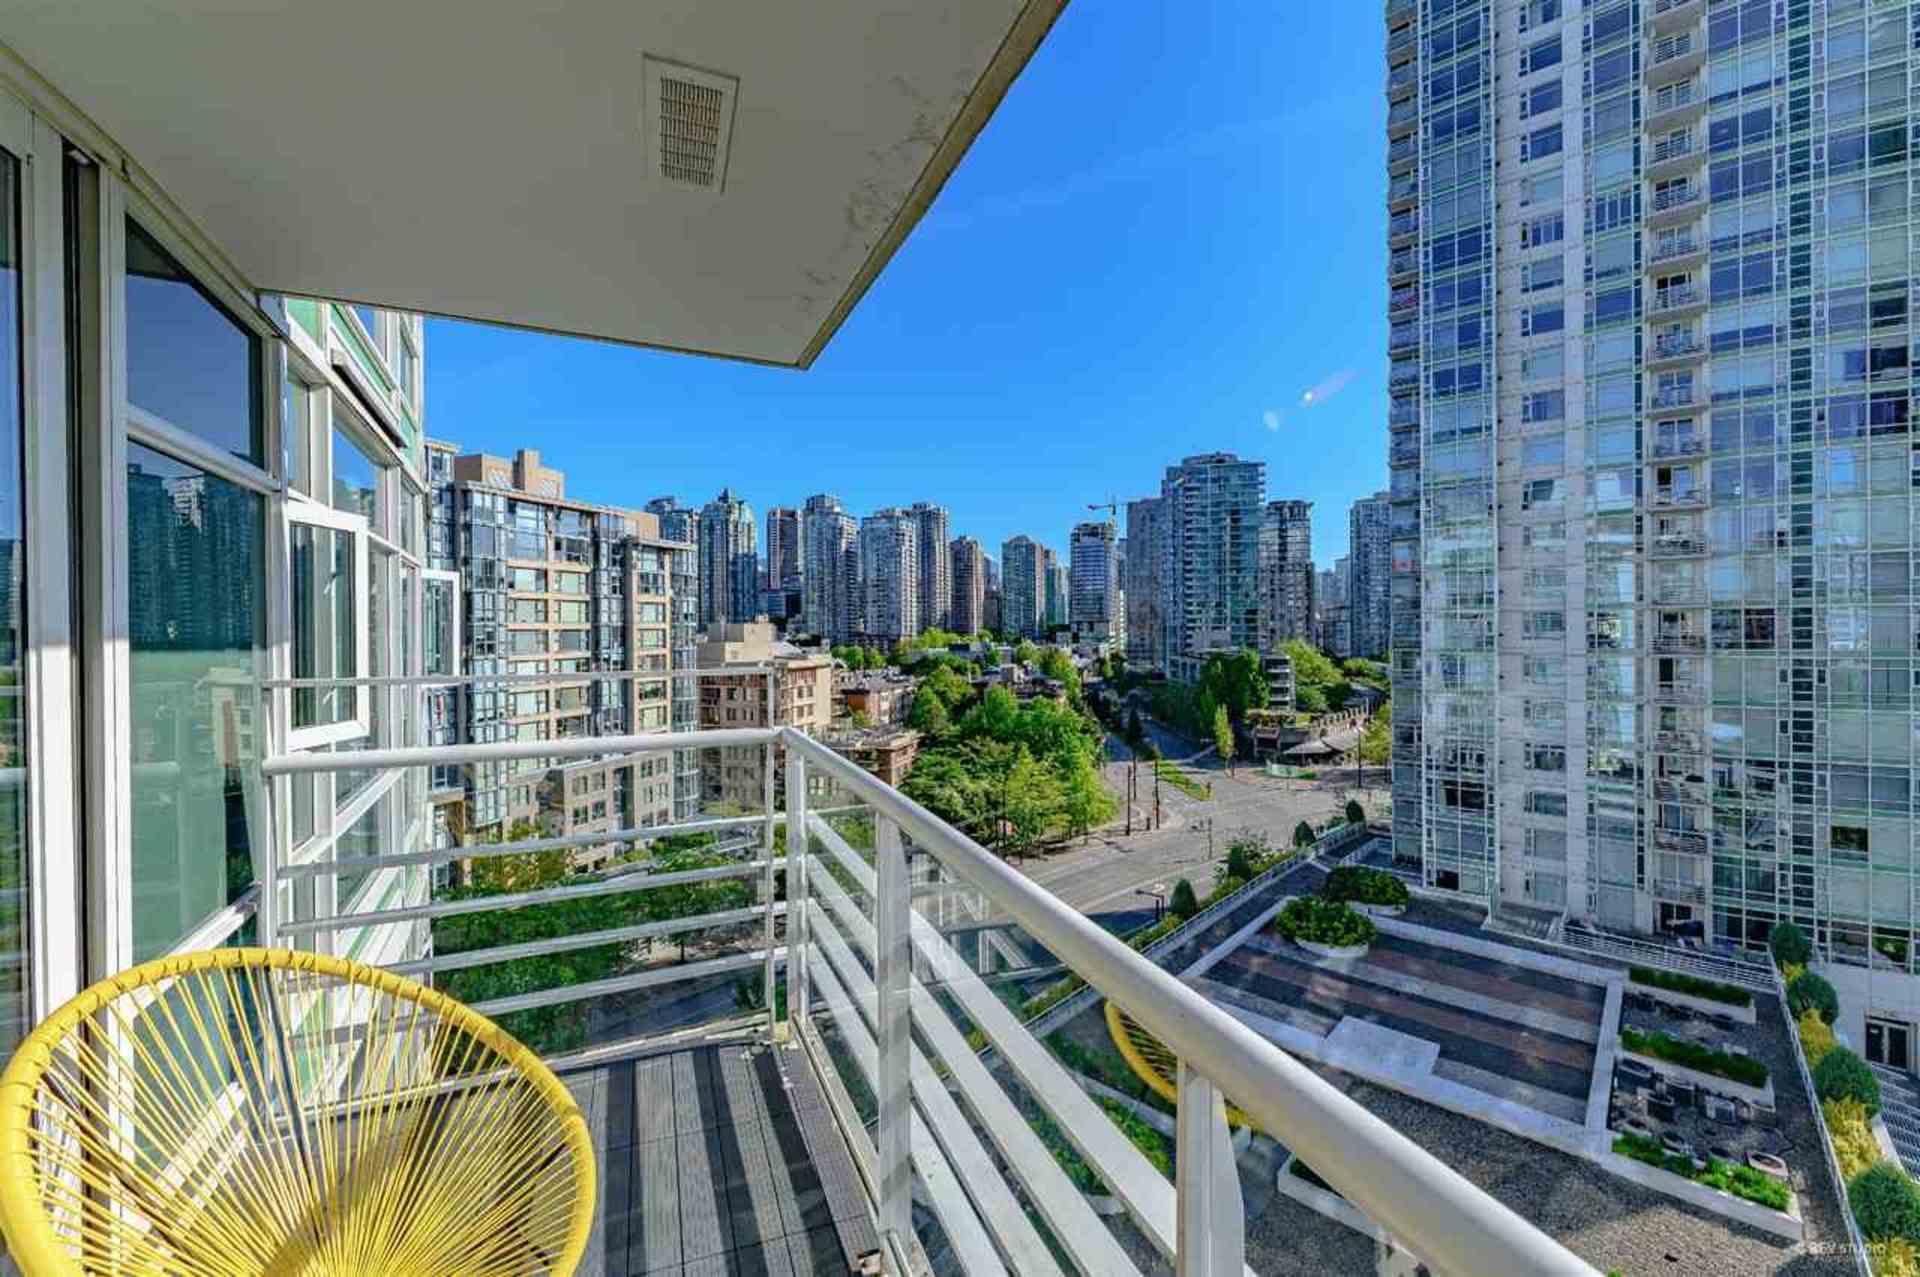 189-davie-street-yaletown-vancouver-west-08 at 1105 - 189 Davie Street, Yaletown, Vancouver West